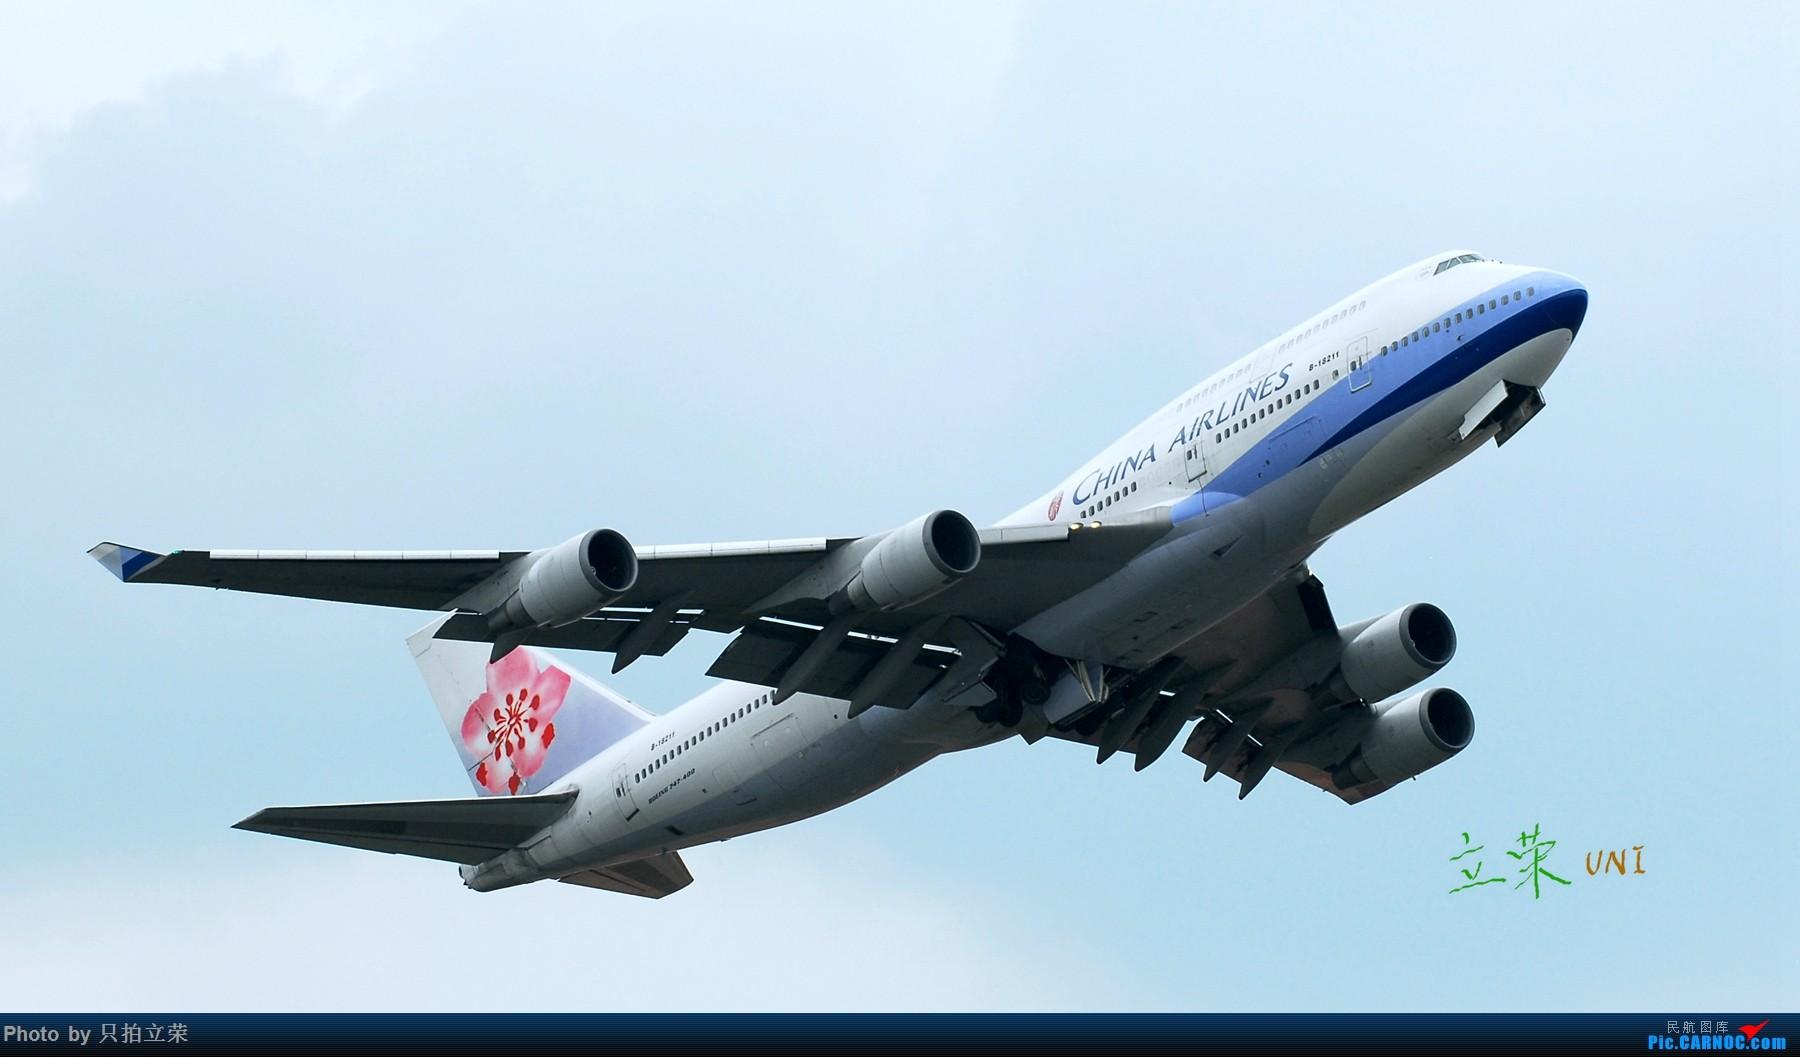 Re:[原创]第一次发图,长沙的大梅花们 BOEING 747-400 B-18211 中国长沙黄花国际机场